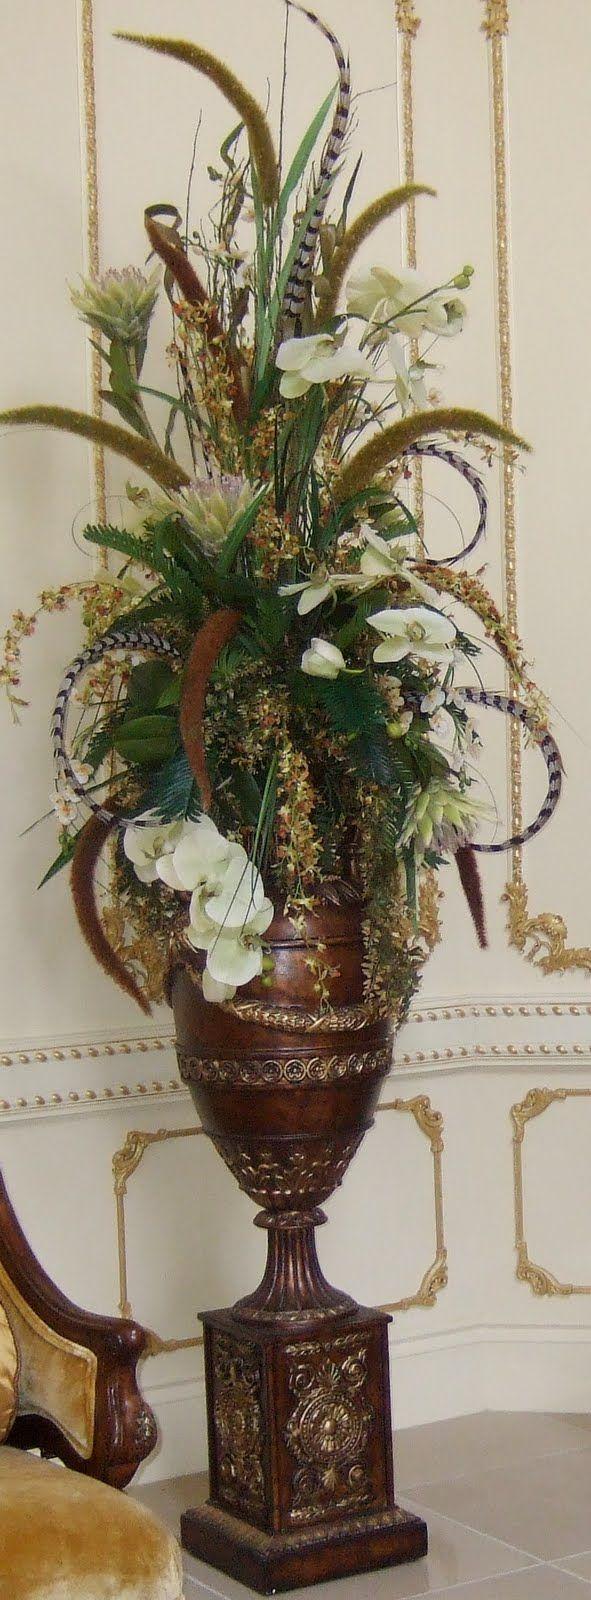 Ana Silk Flowers Images Beautiful And Luxury Huge Silk